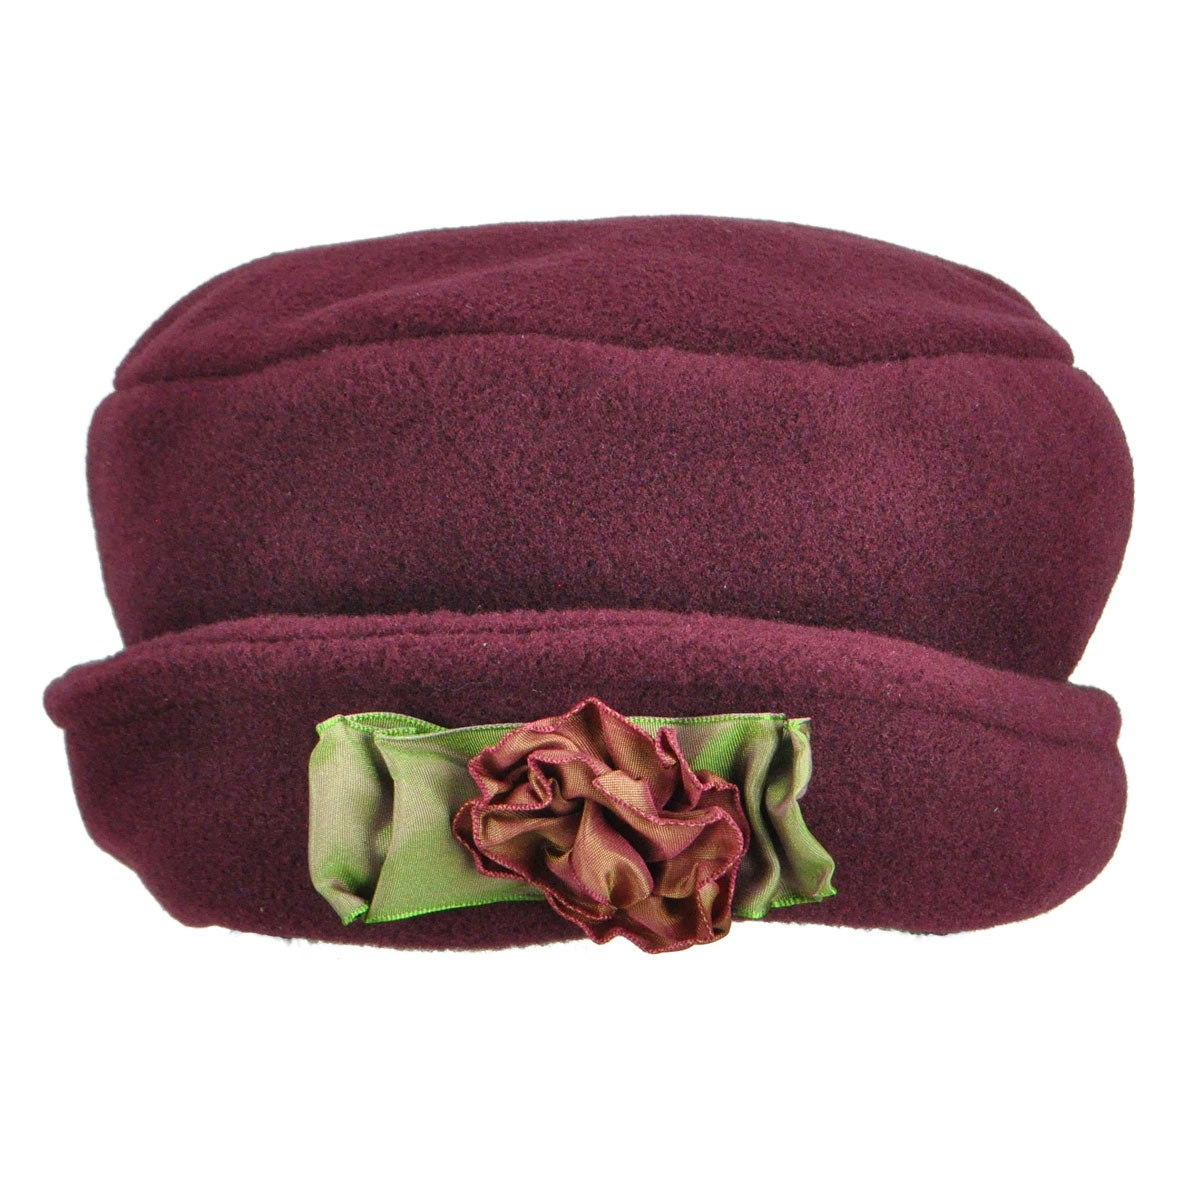 Edwardian Style Hats, Titanic Hats, Derby Hats Vail Cloche $43.00 AT vintagedancer.com